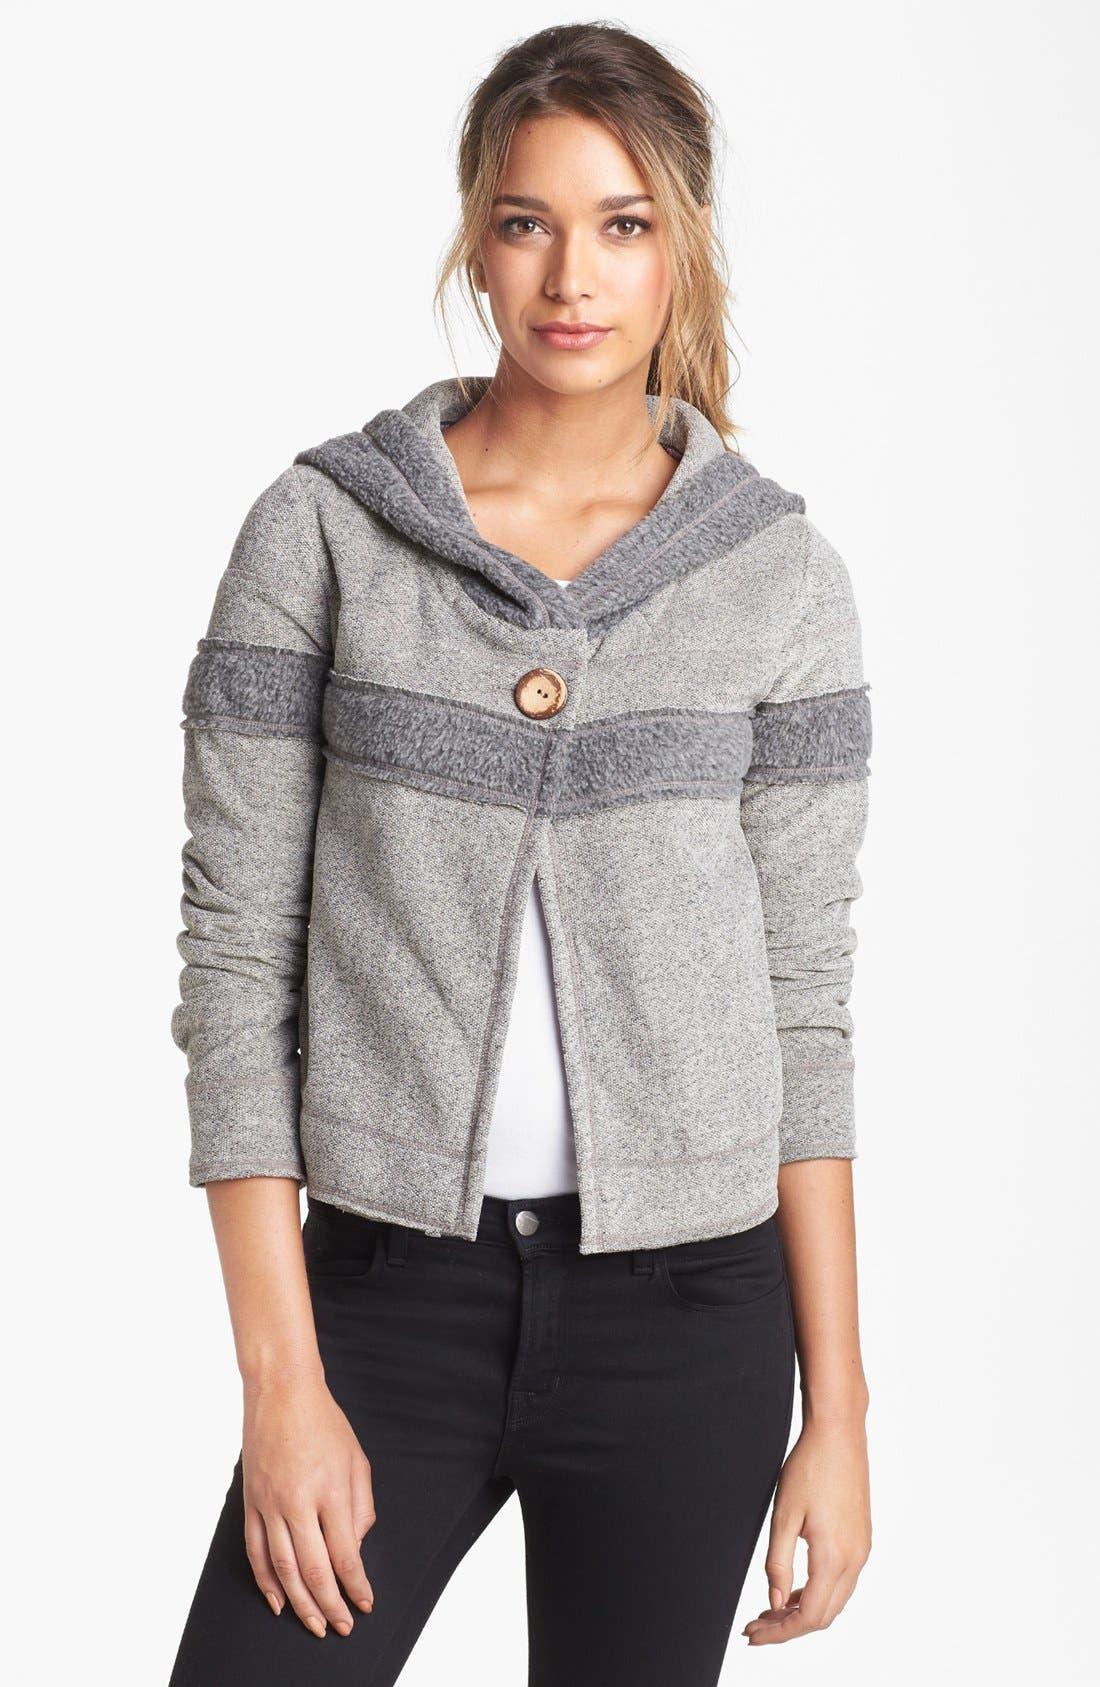 Main Image - prAna 'Lanie' Jacket